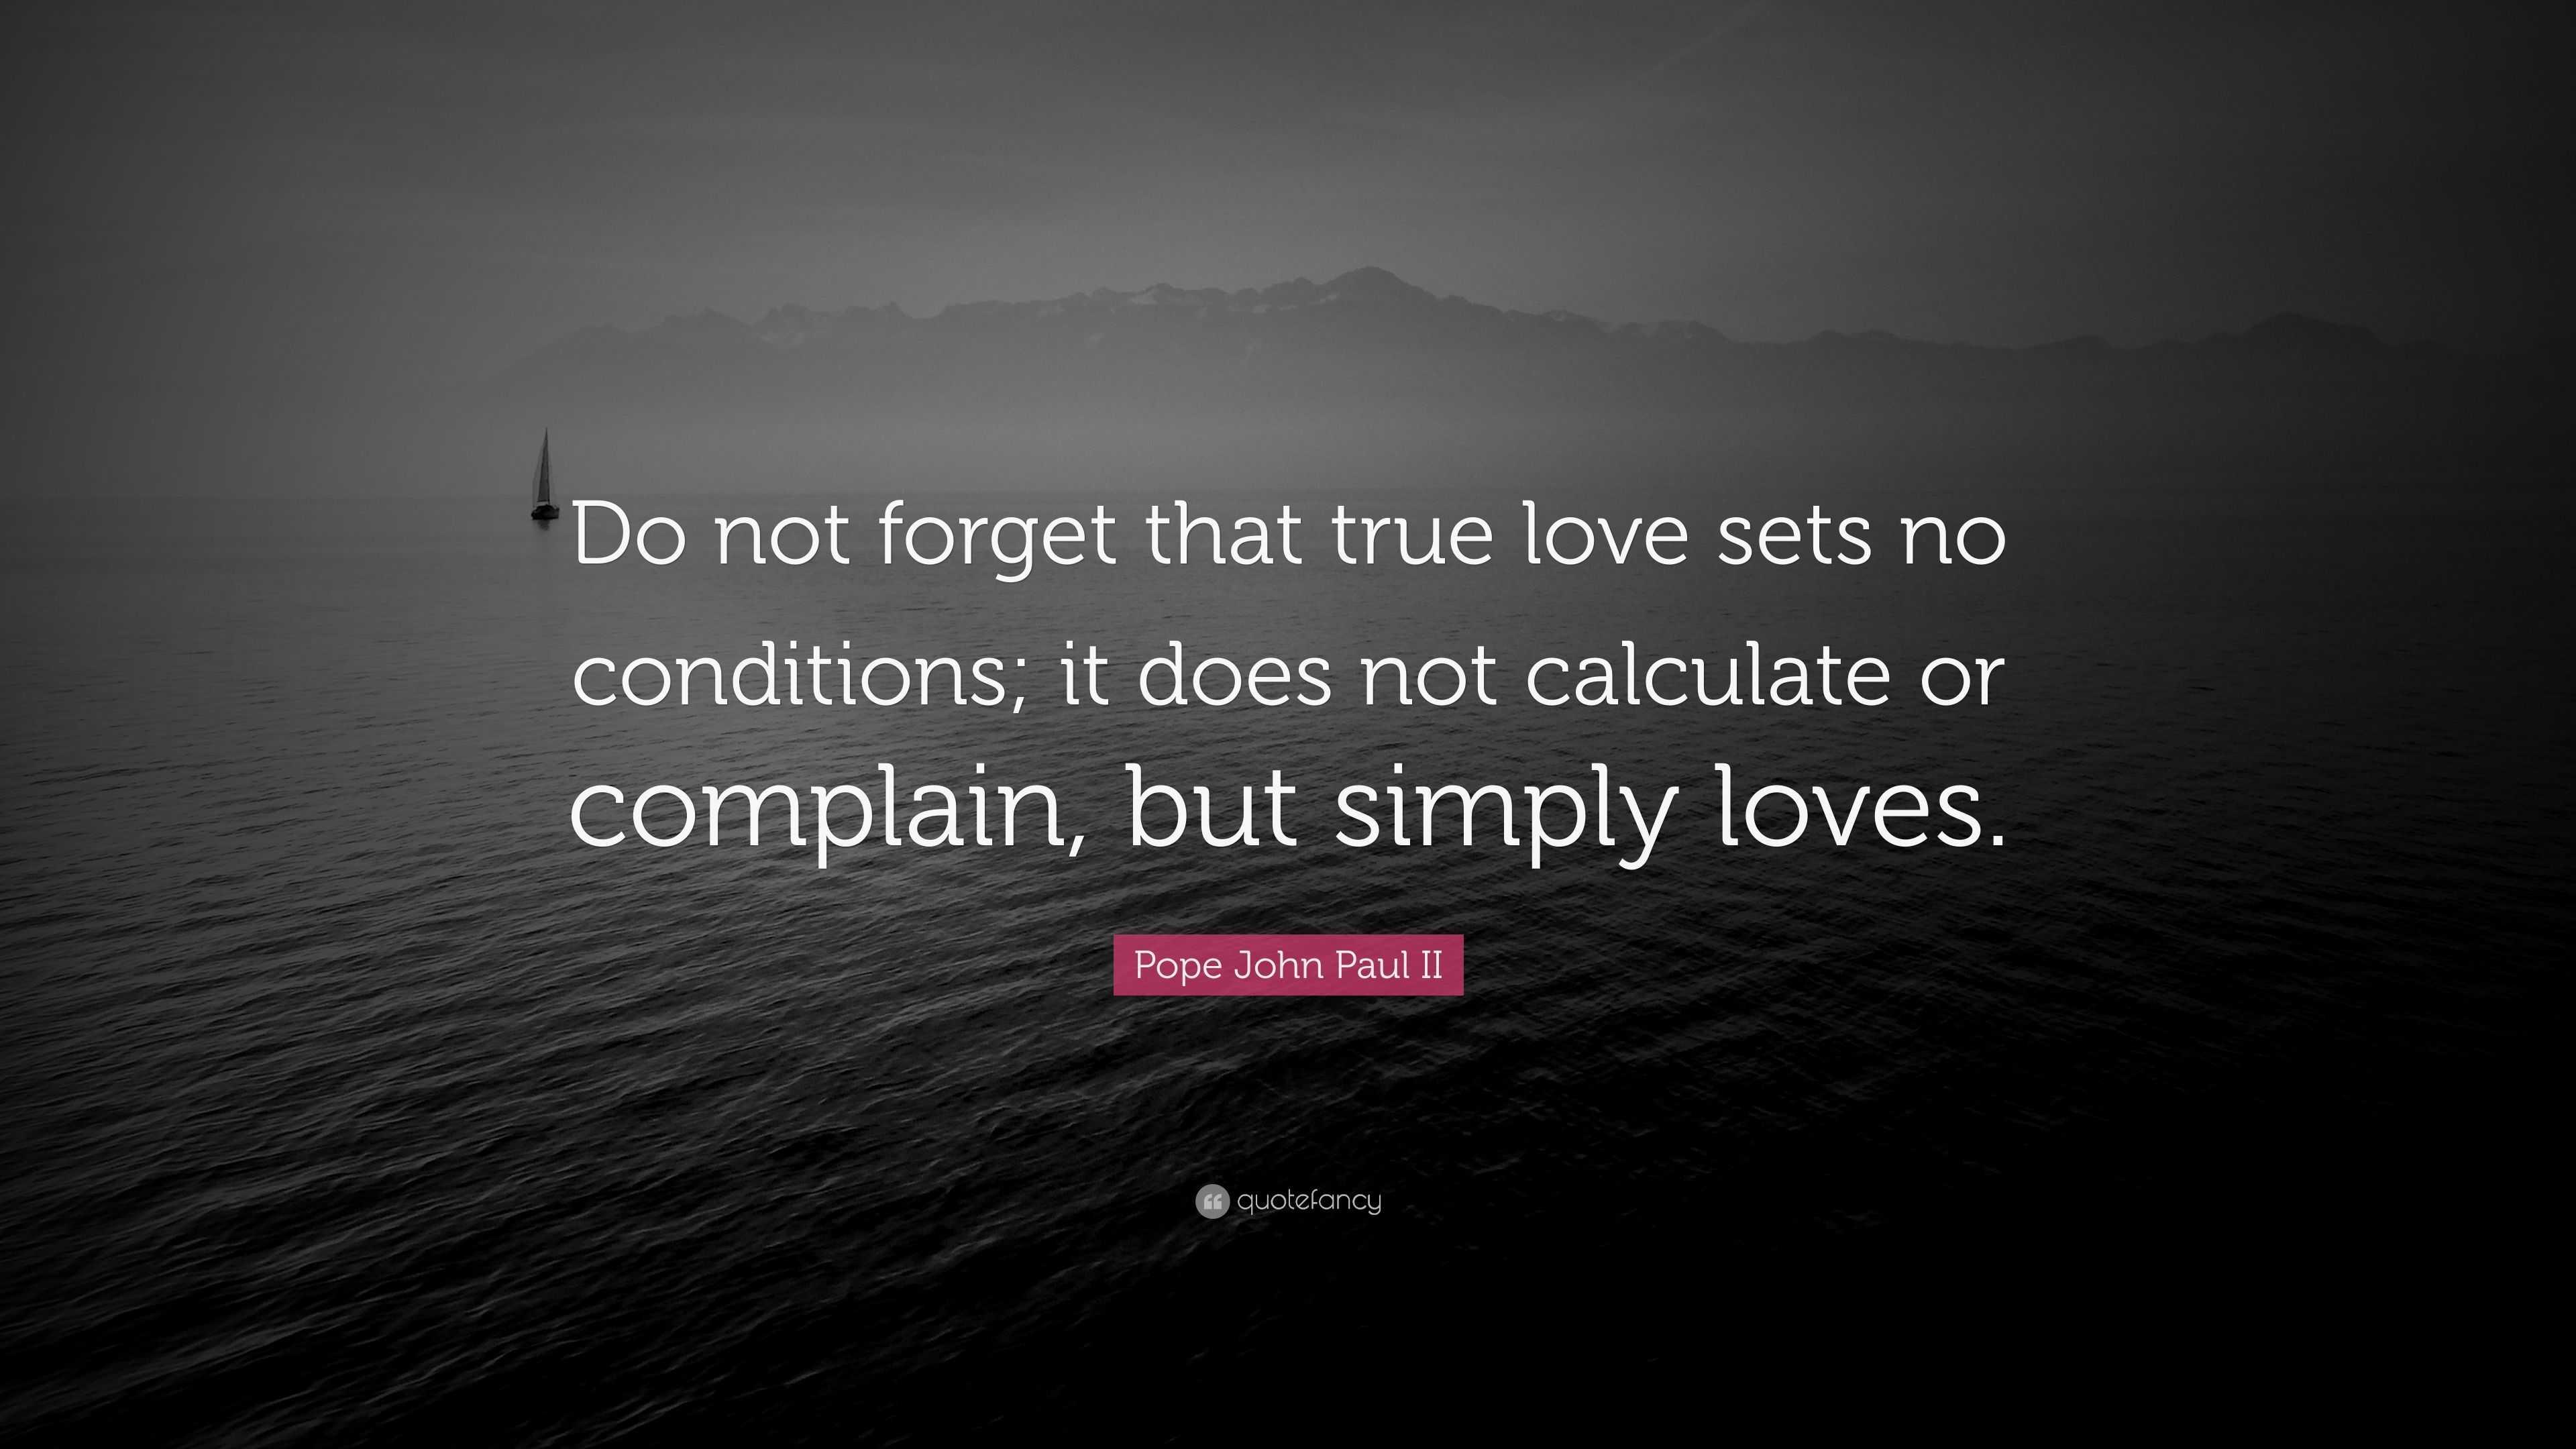 Is it true love or simply